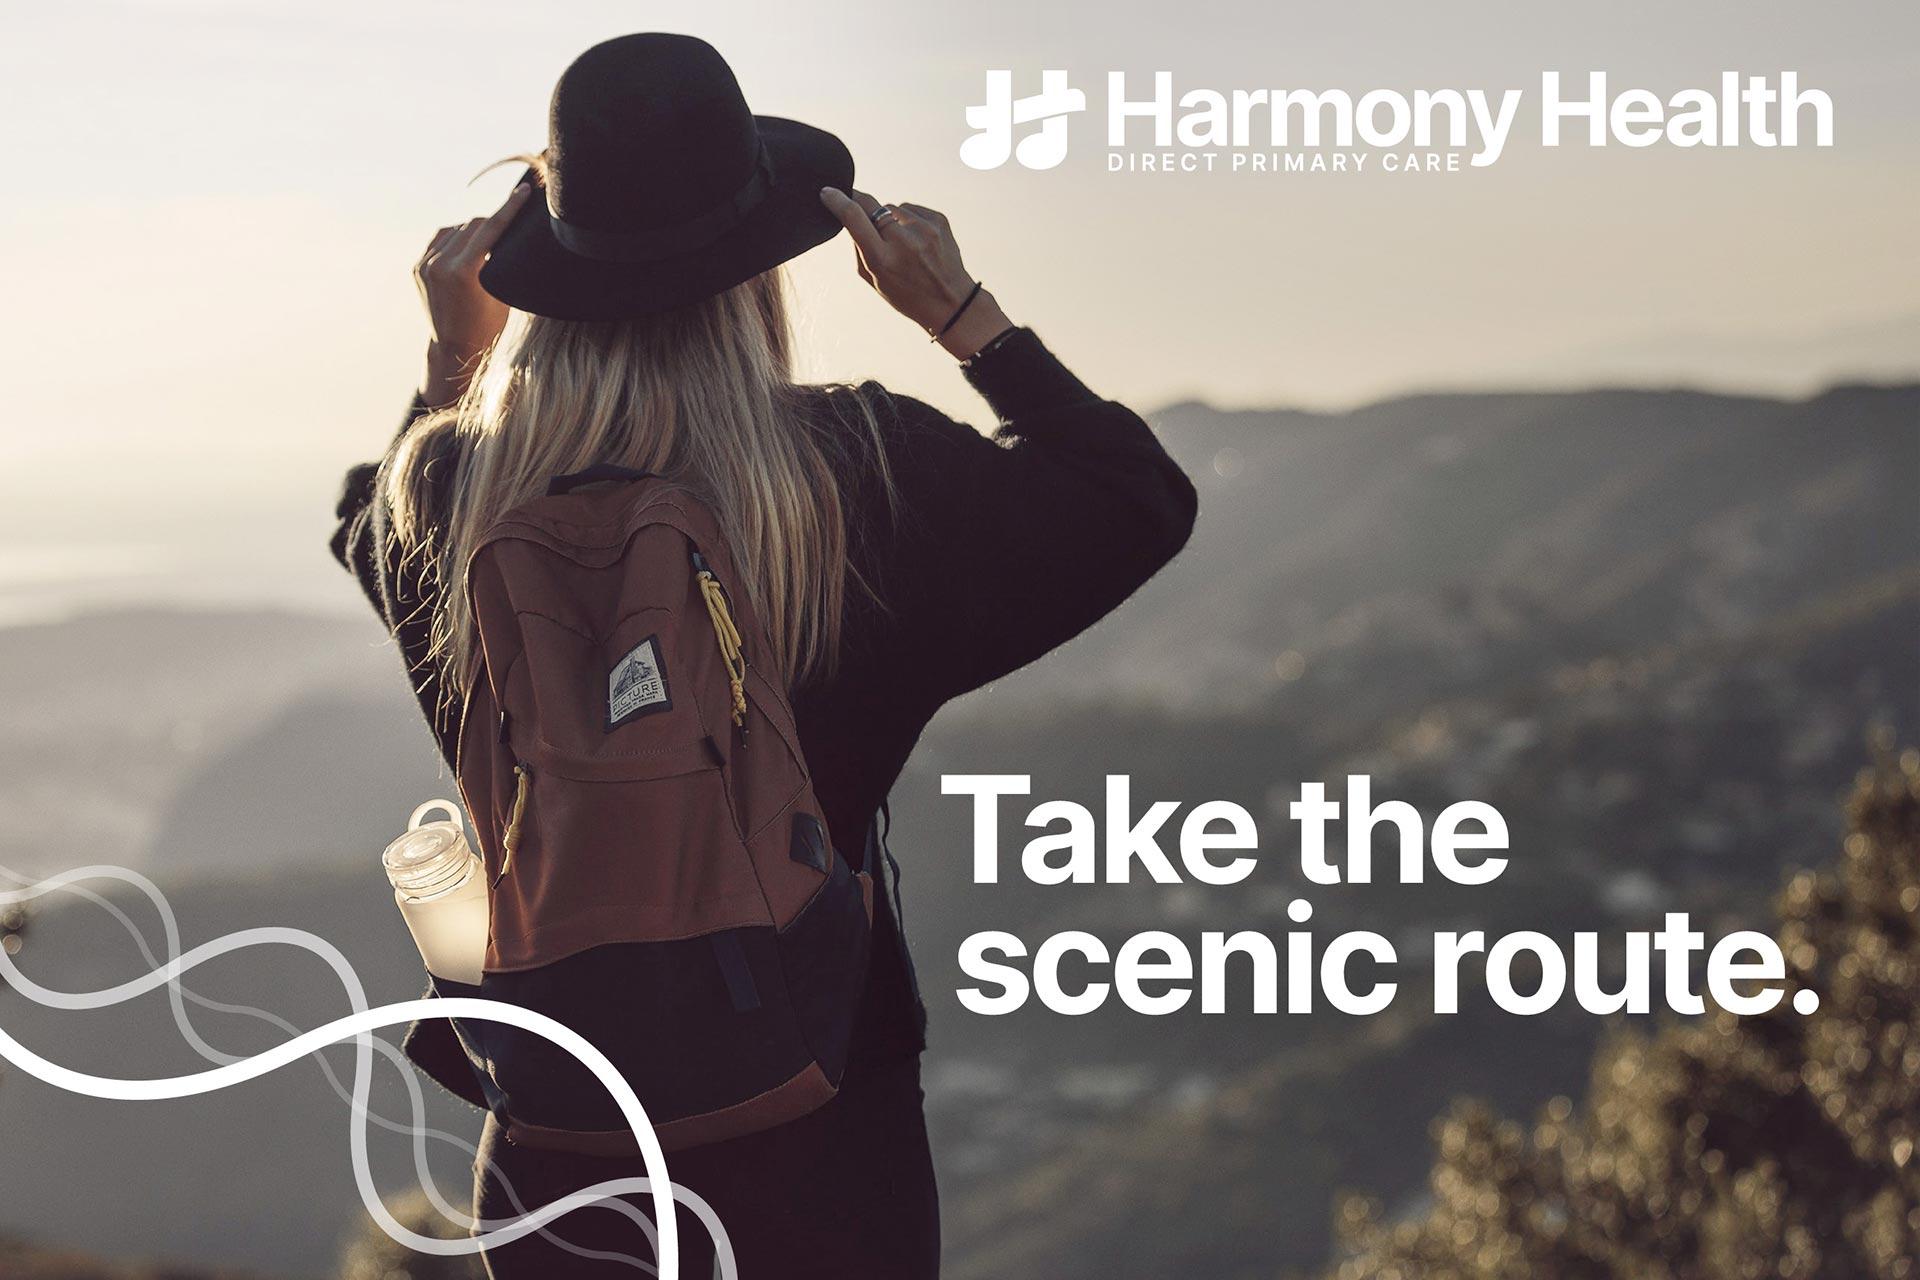 A hero image to assist the Harmony Health marketing efforts.